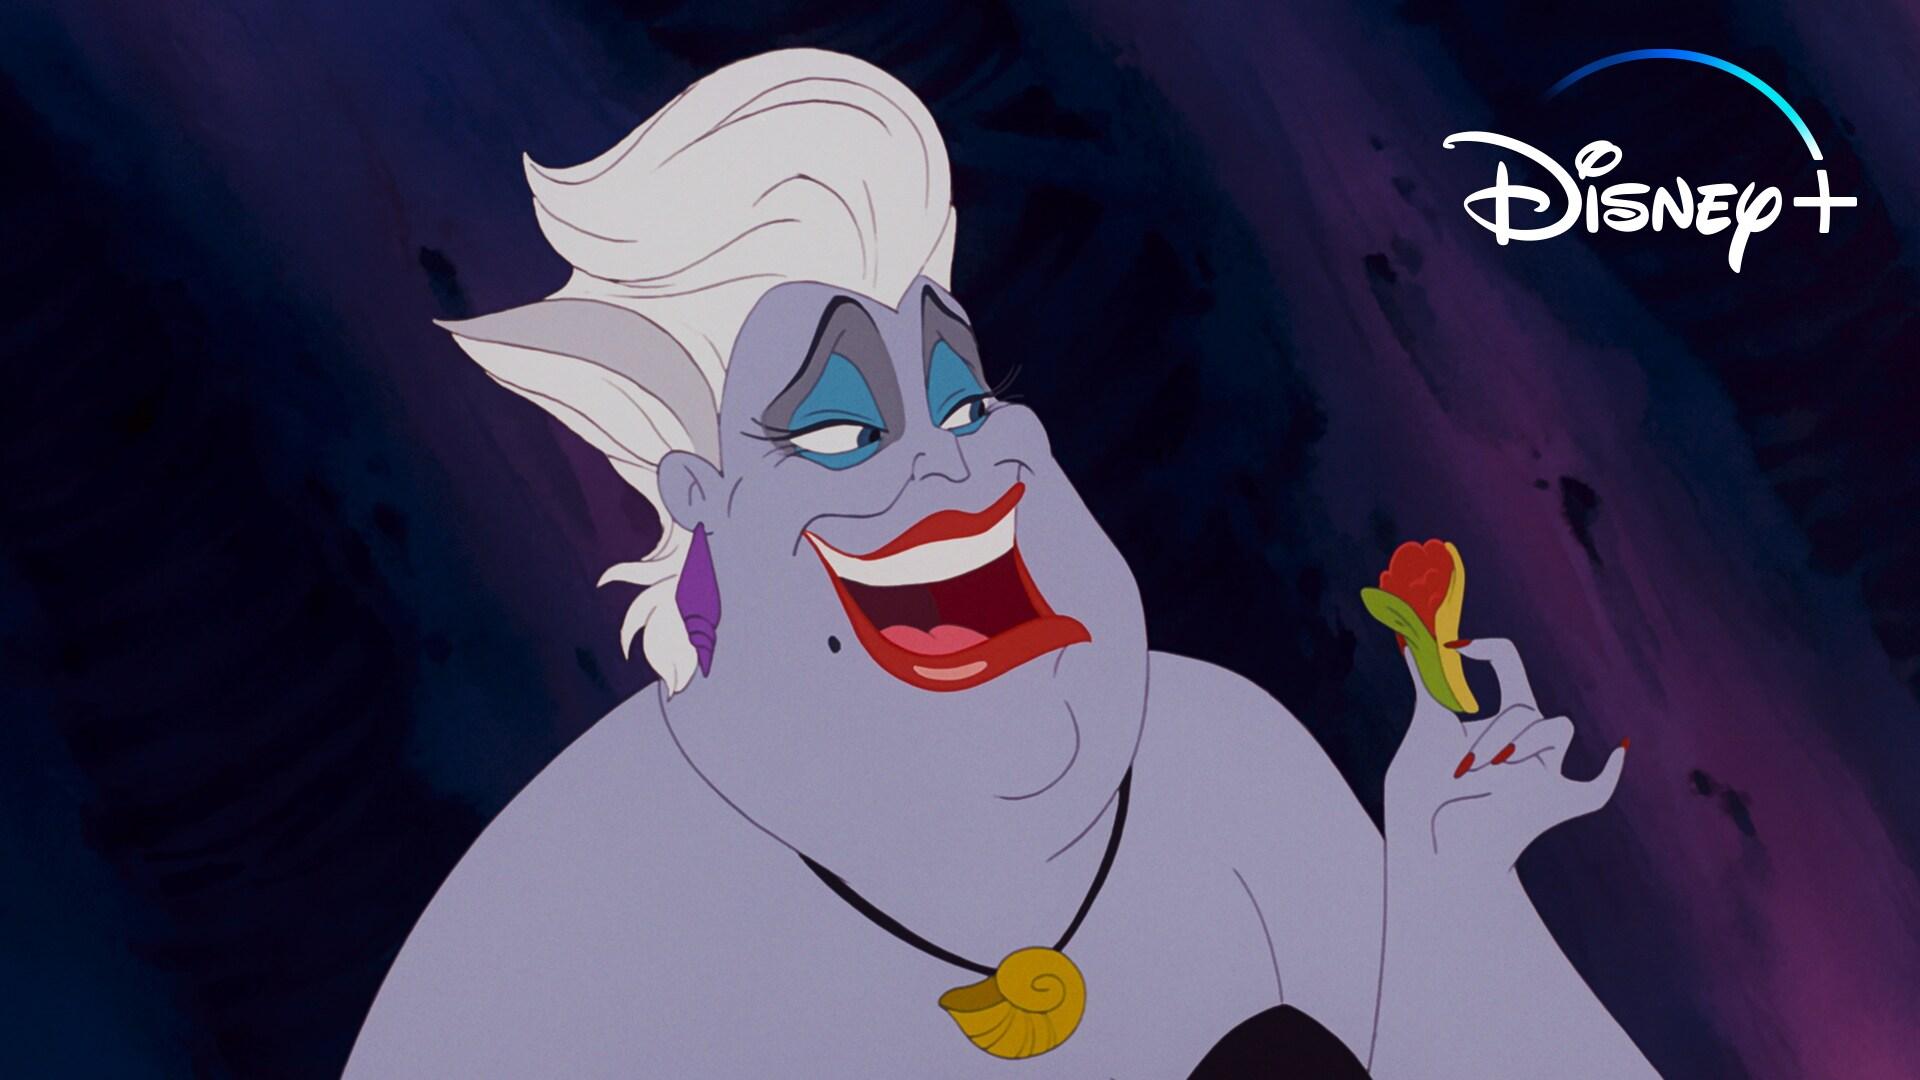 Beauty Tips Across Disney+ | Disney+